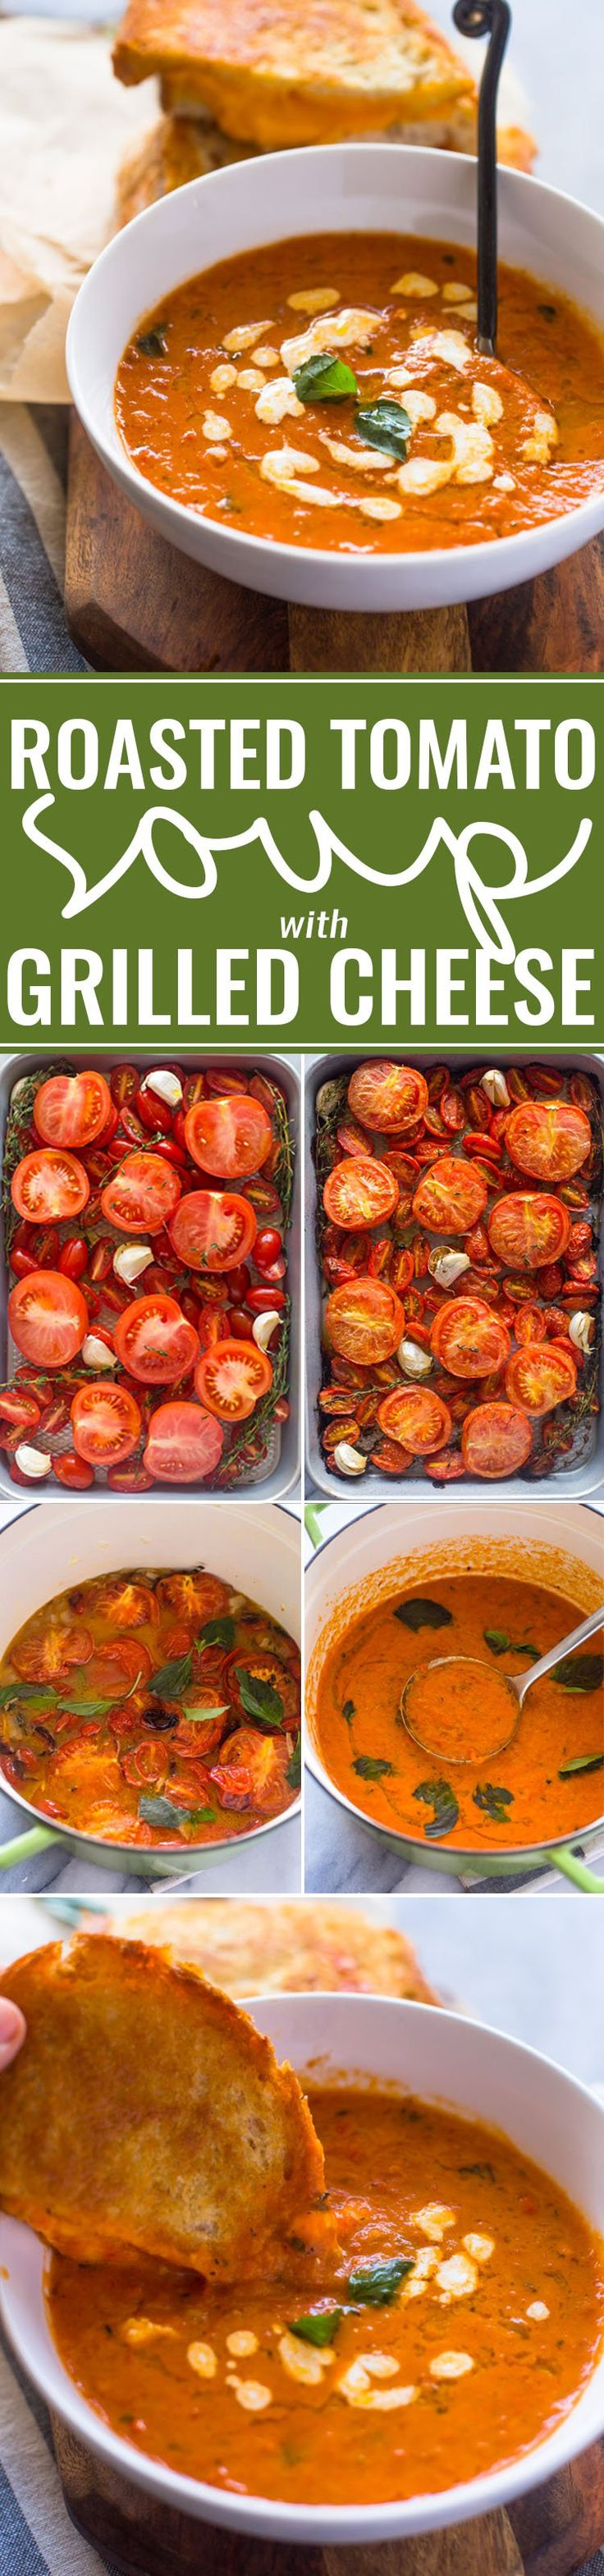 Easy Roasted Tomato Basil Soup More